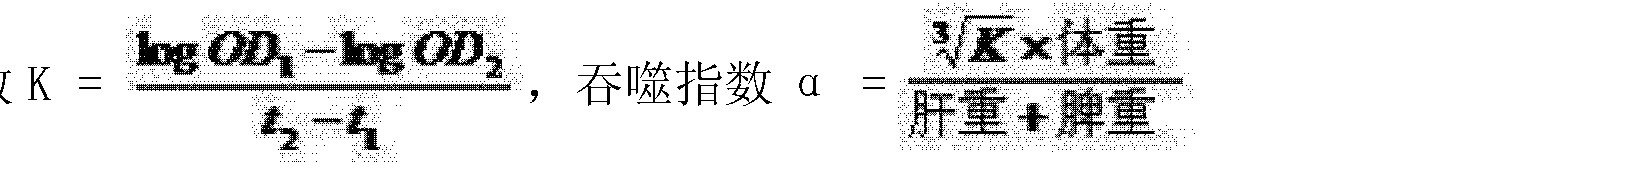 Figure CN104489760AD00072